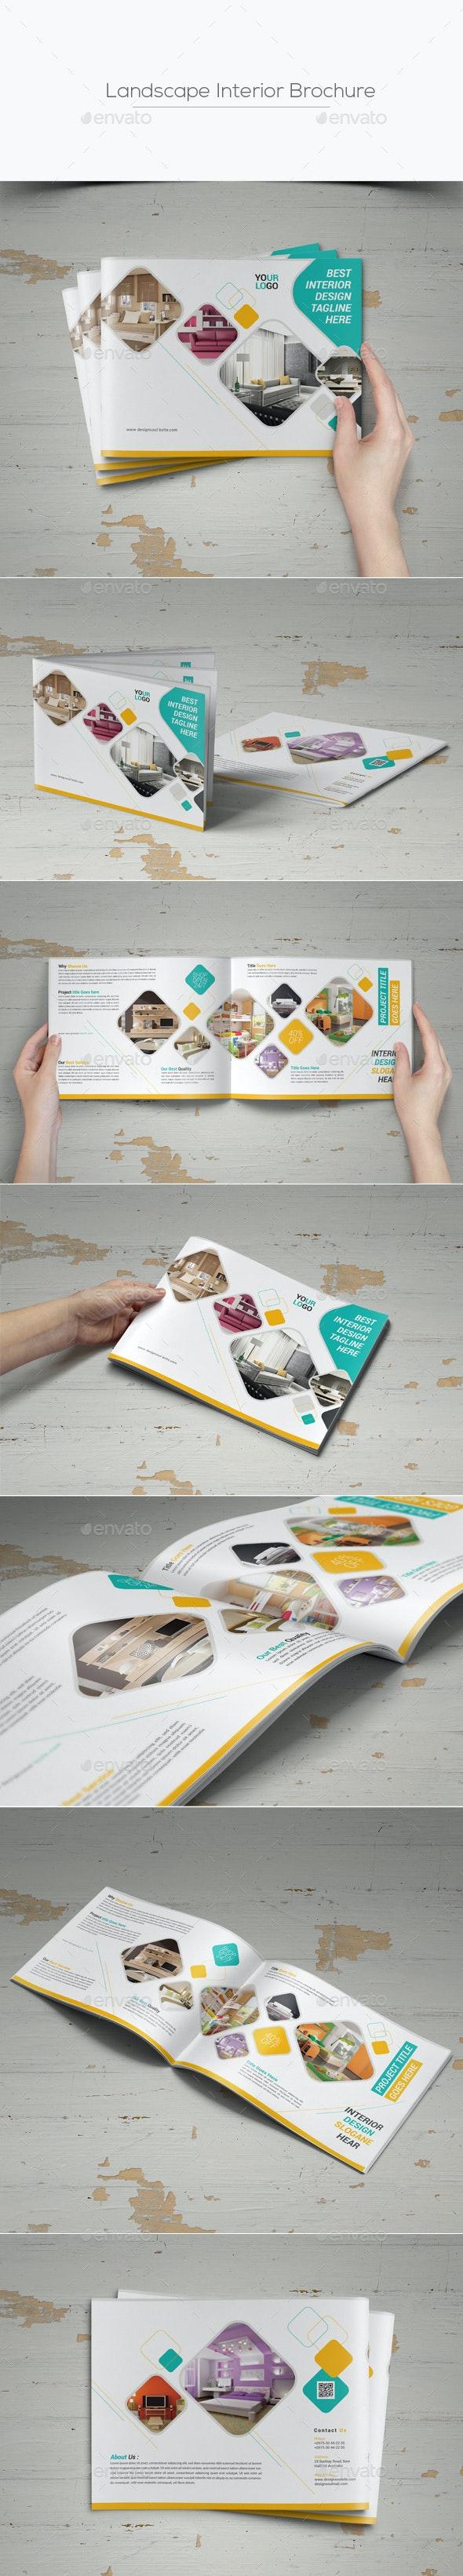 Landscape Interior Brochure - Corporate Brochures